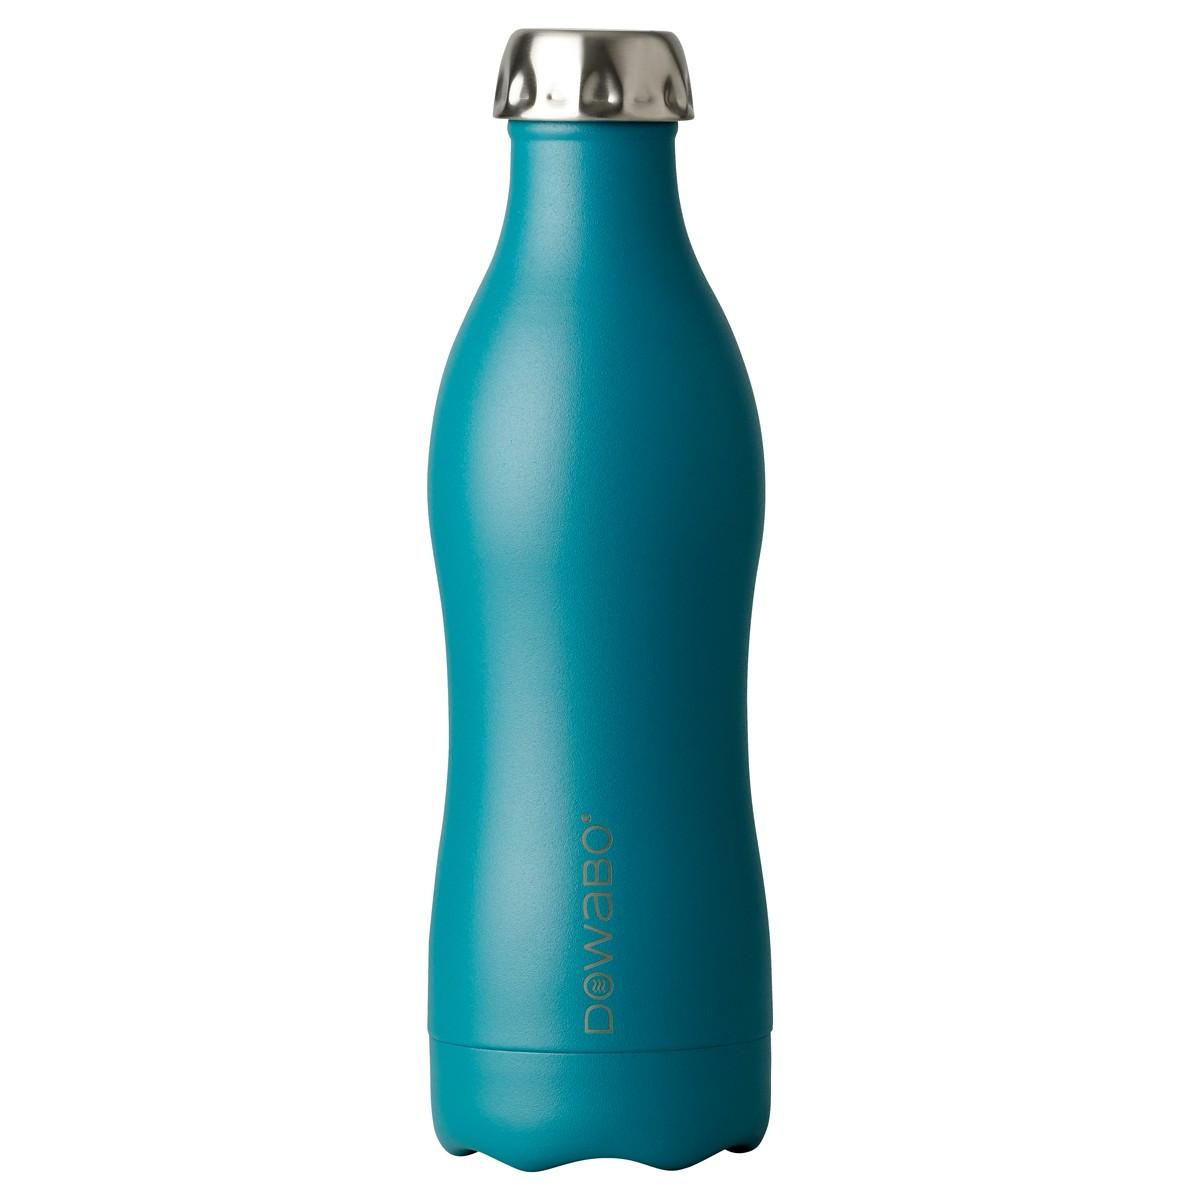 DOWABO® Bottle - Petrol 500ml Earth Collection